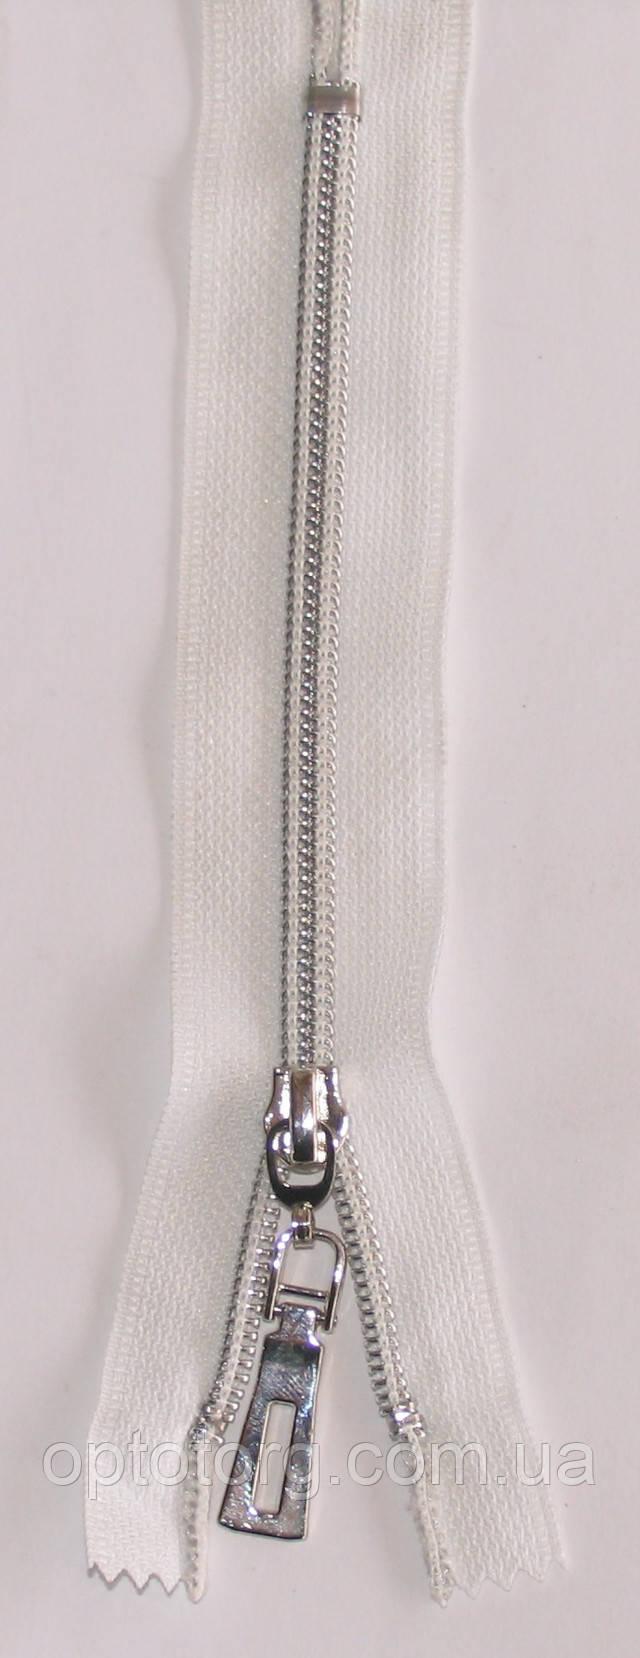 сильвер карманка №7 змейка молния серебро на белой ткани